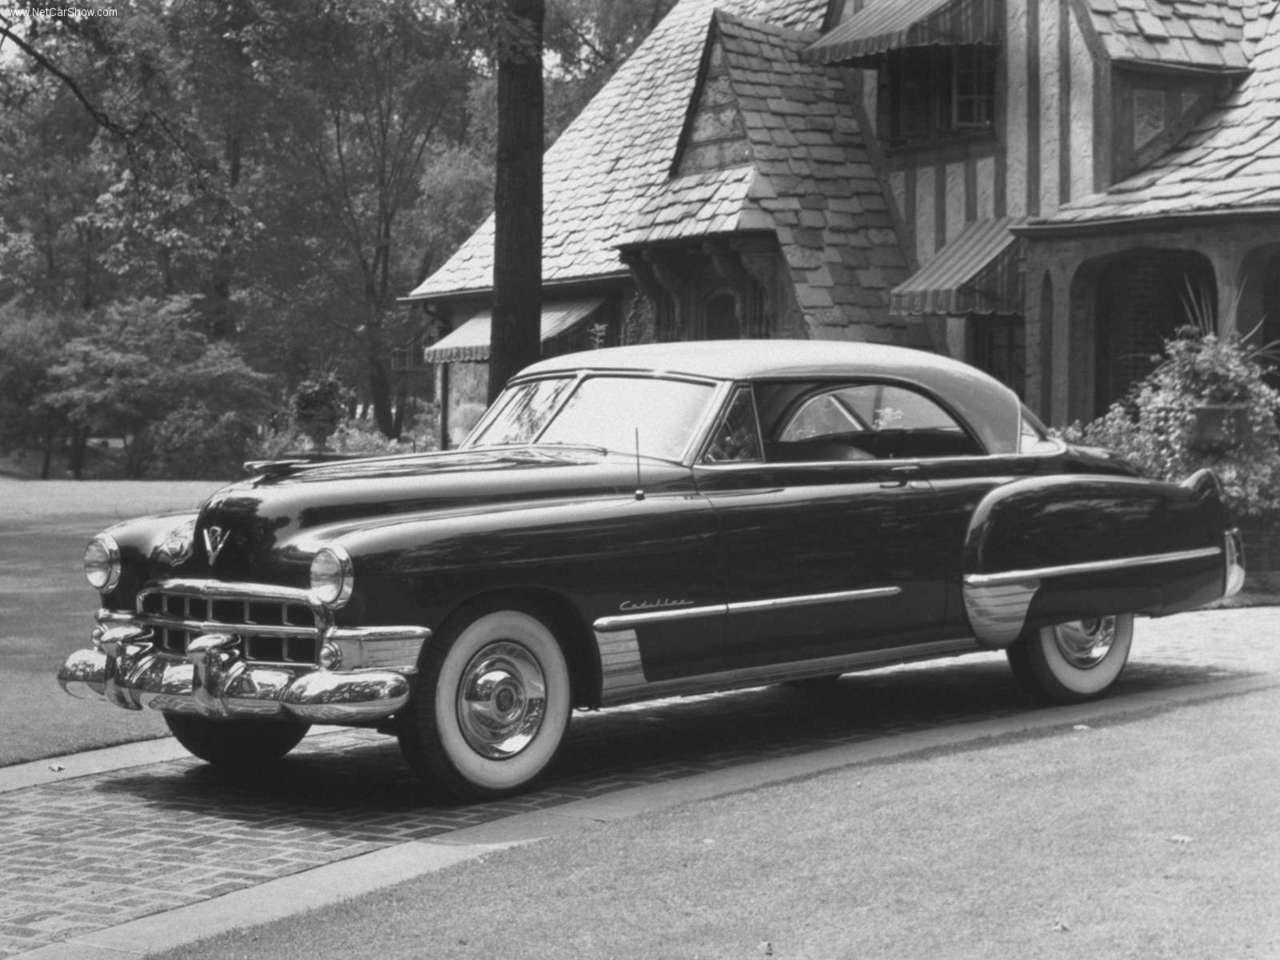 Cadillac DeVille Coupe 1949 Cadillac-DeVille_Coupe-1949-1280-01